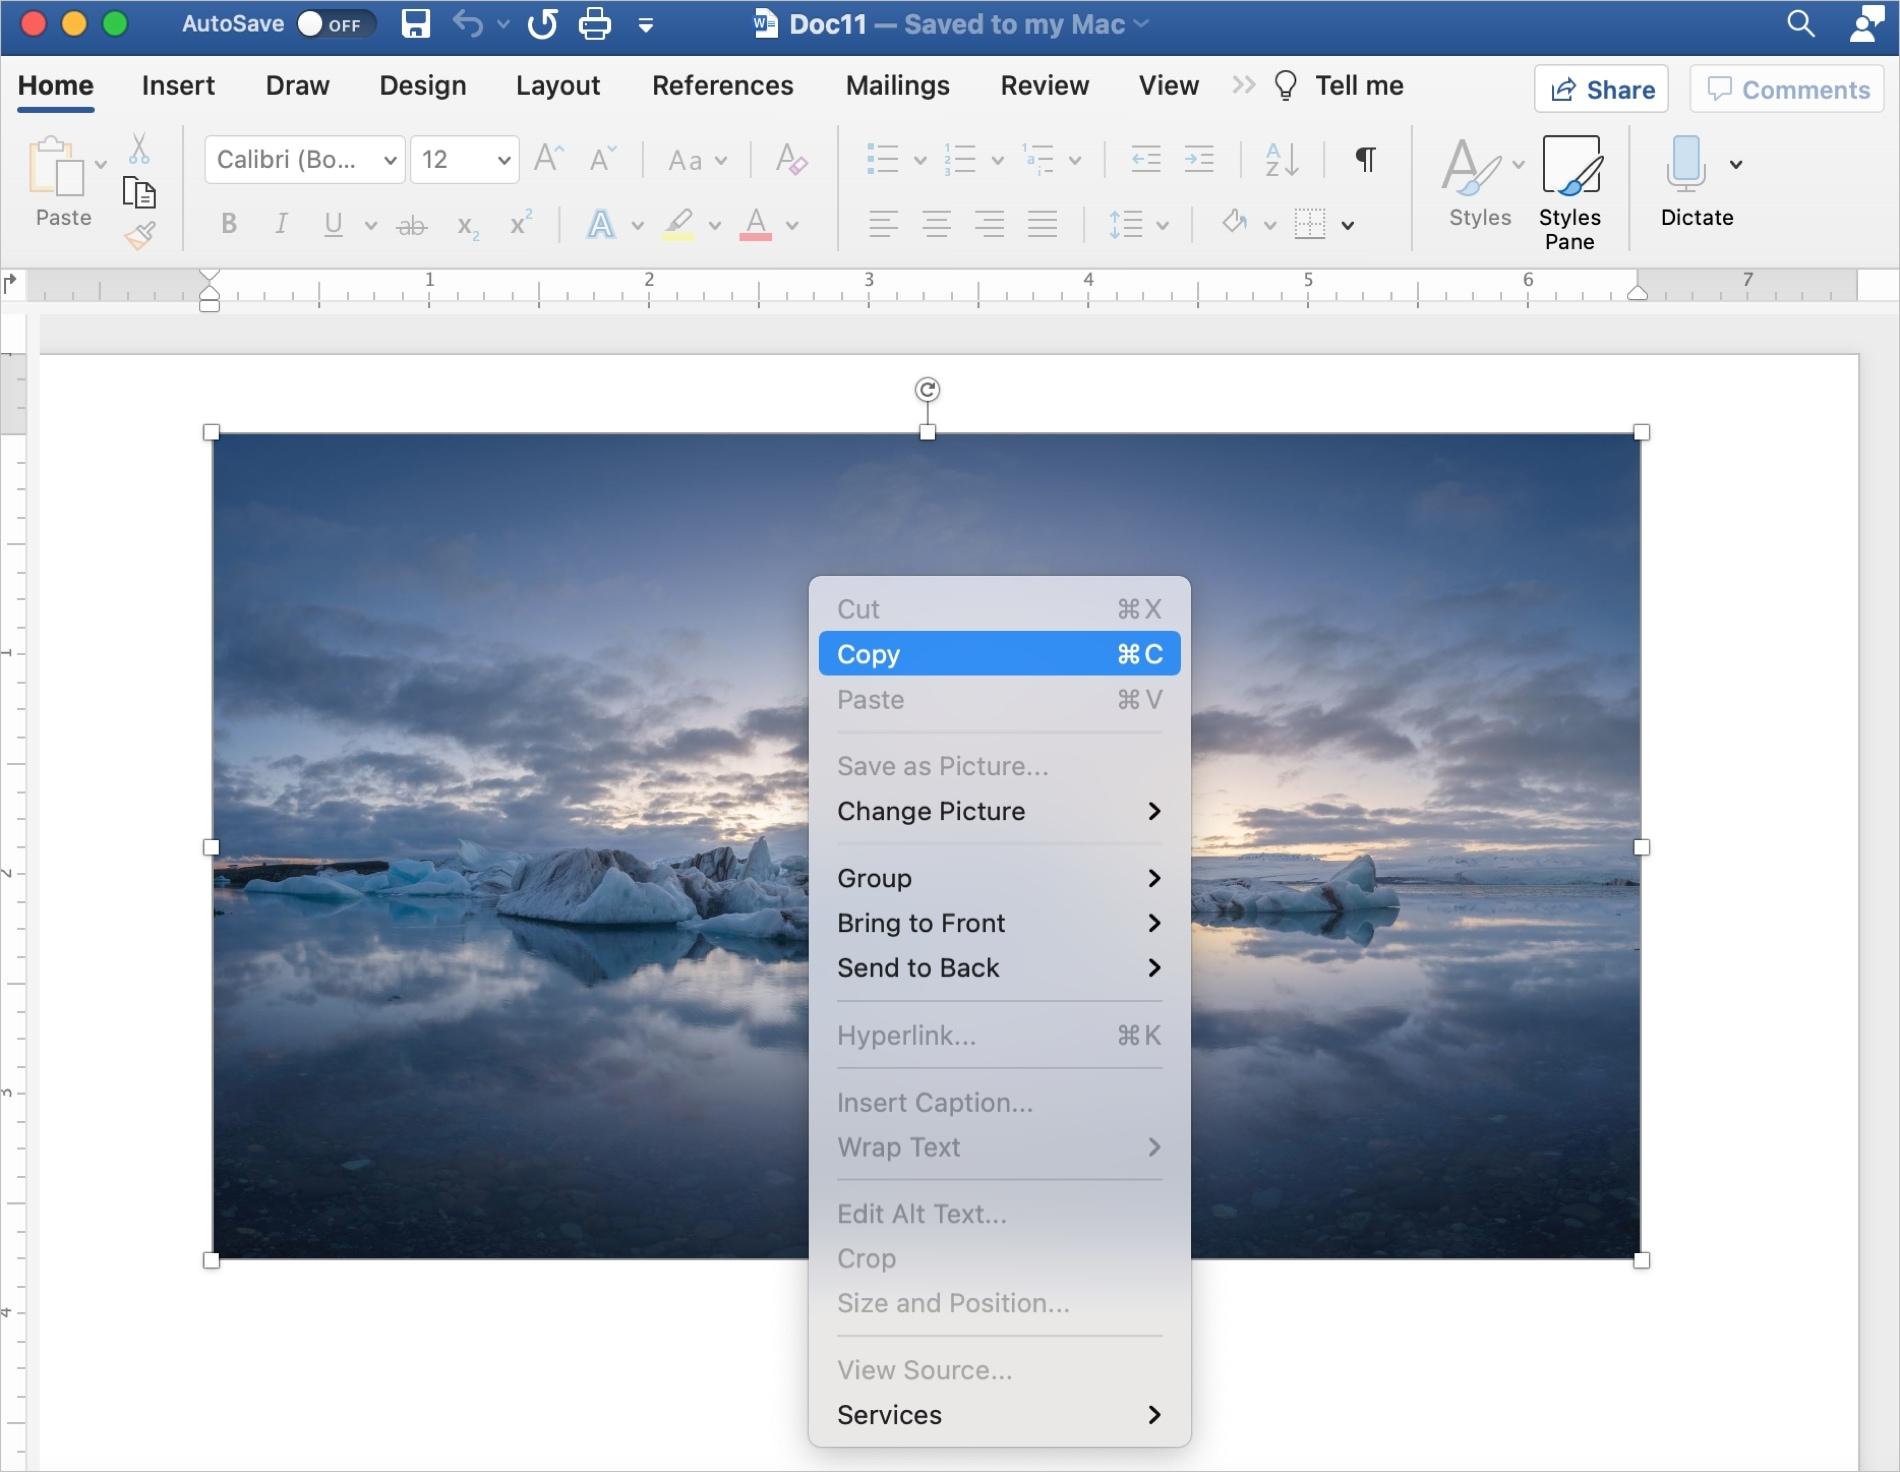 Word Copy Image on Mac